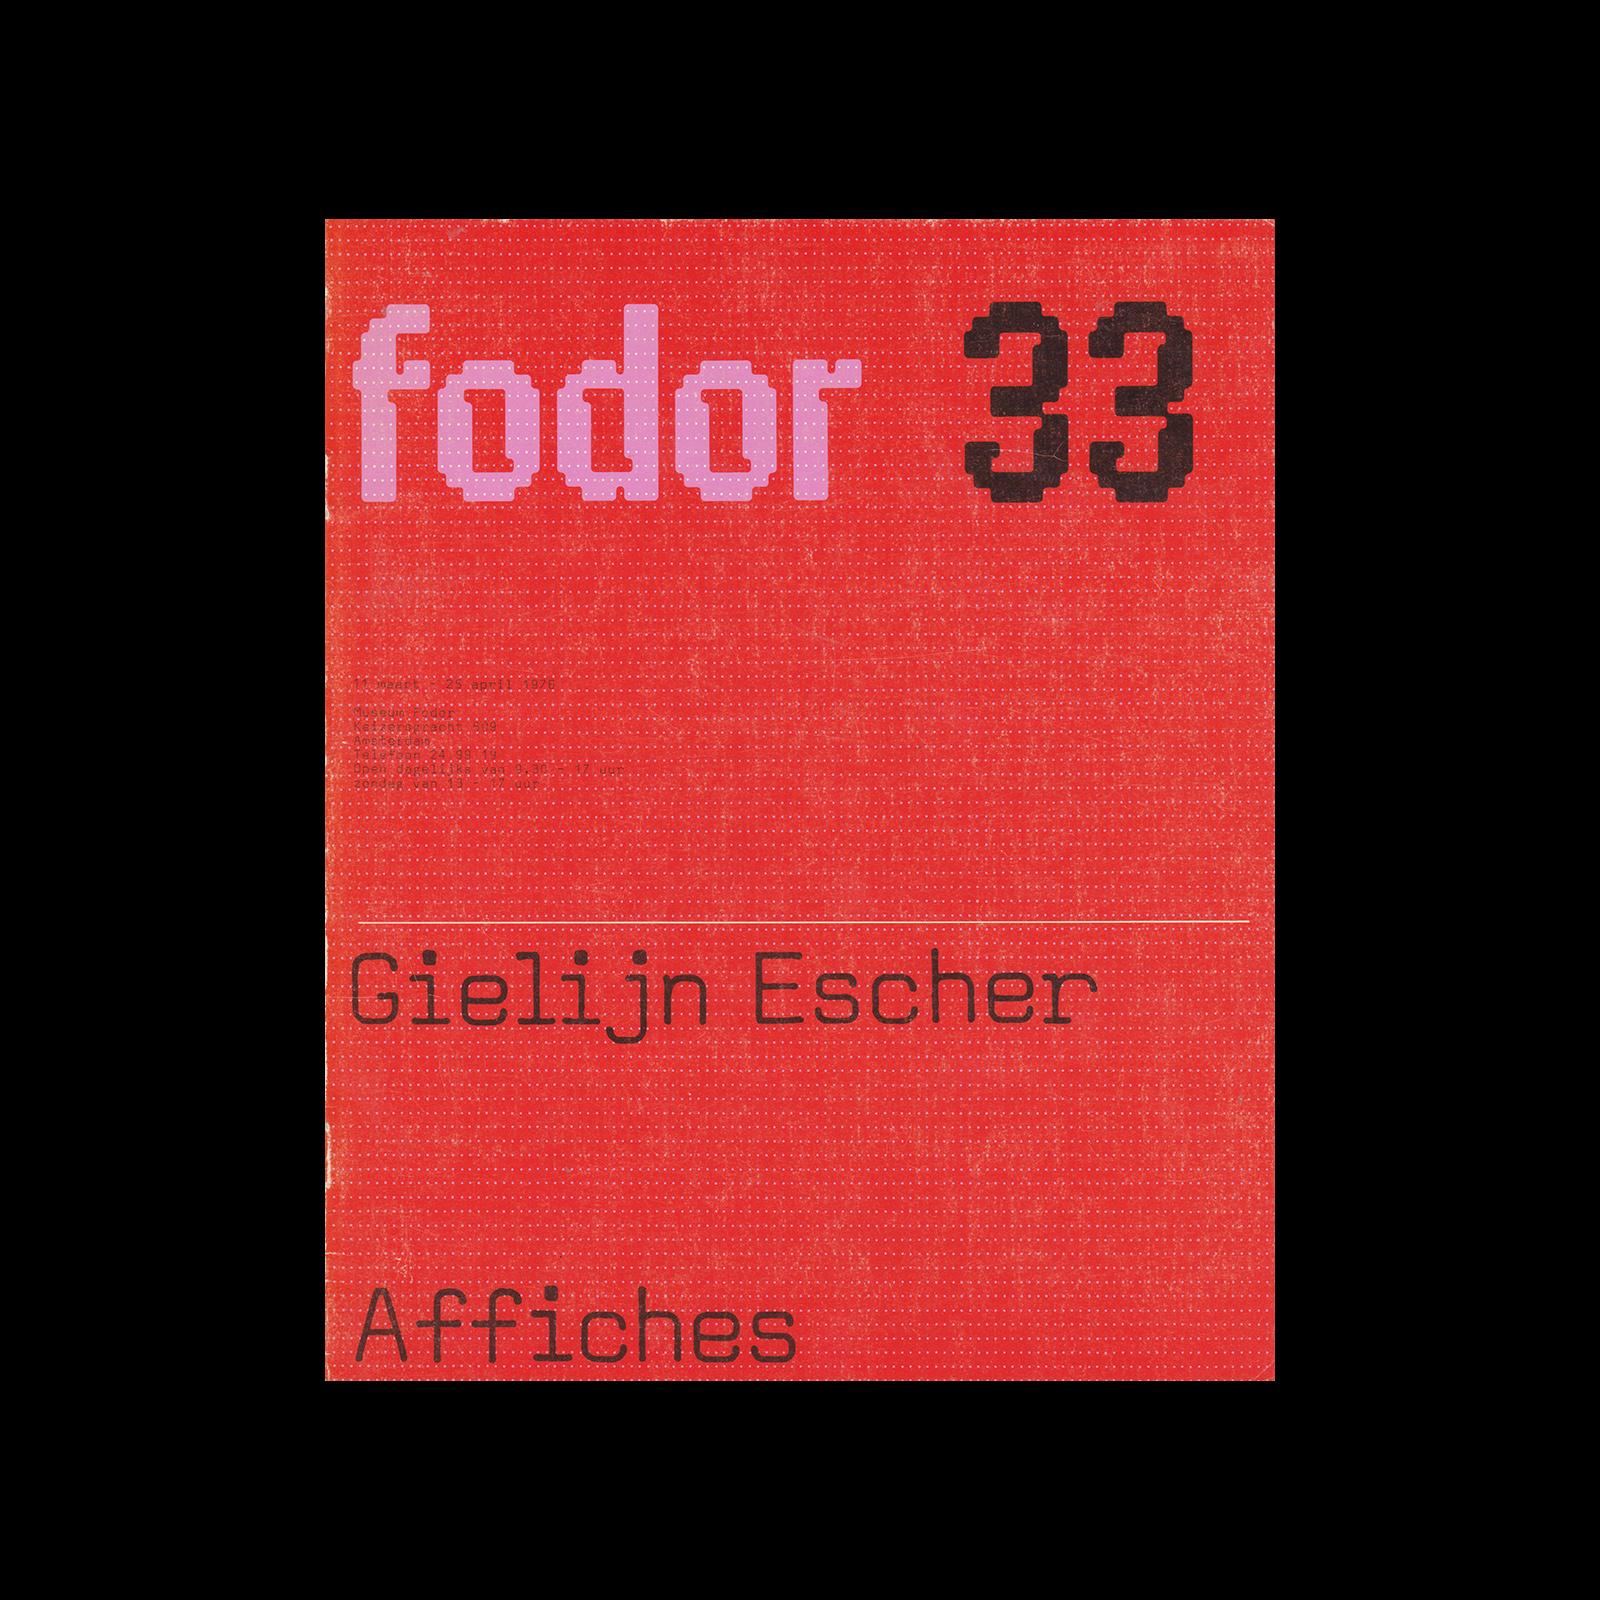 Fodor 33, 1976 - Gielijn Escher, Affiches. Designed by Wim Crouwel and Daphne Duijvelshoff (Total Design)